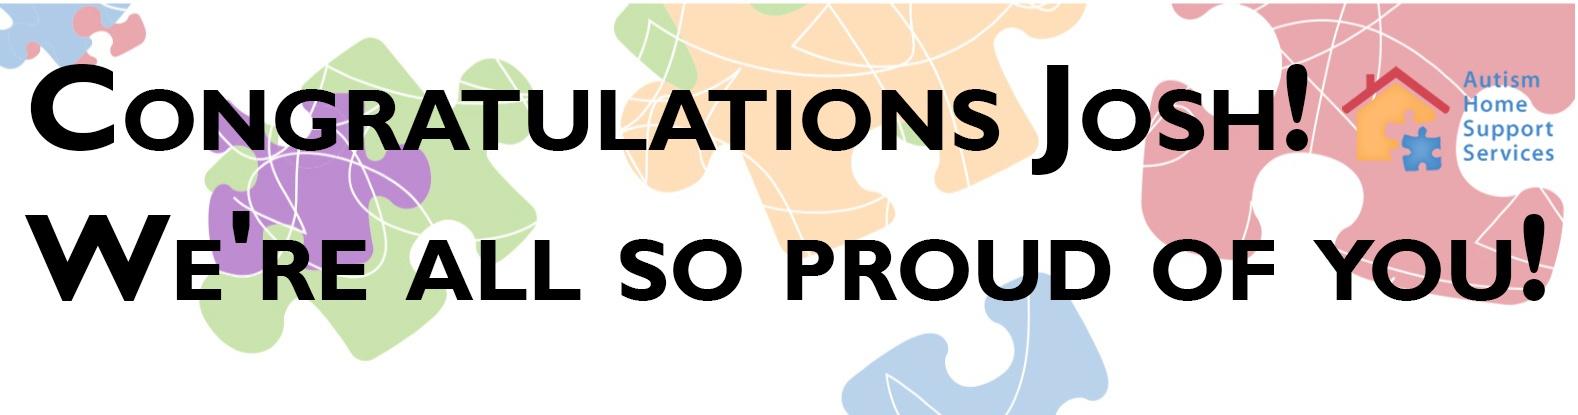 congratulations josh.jpg